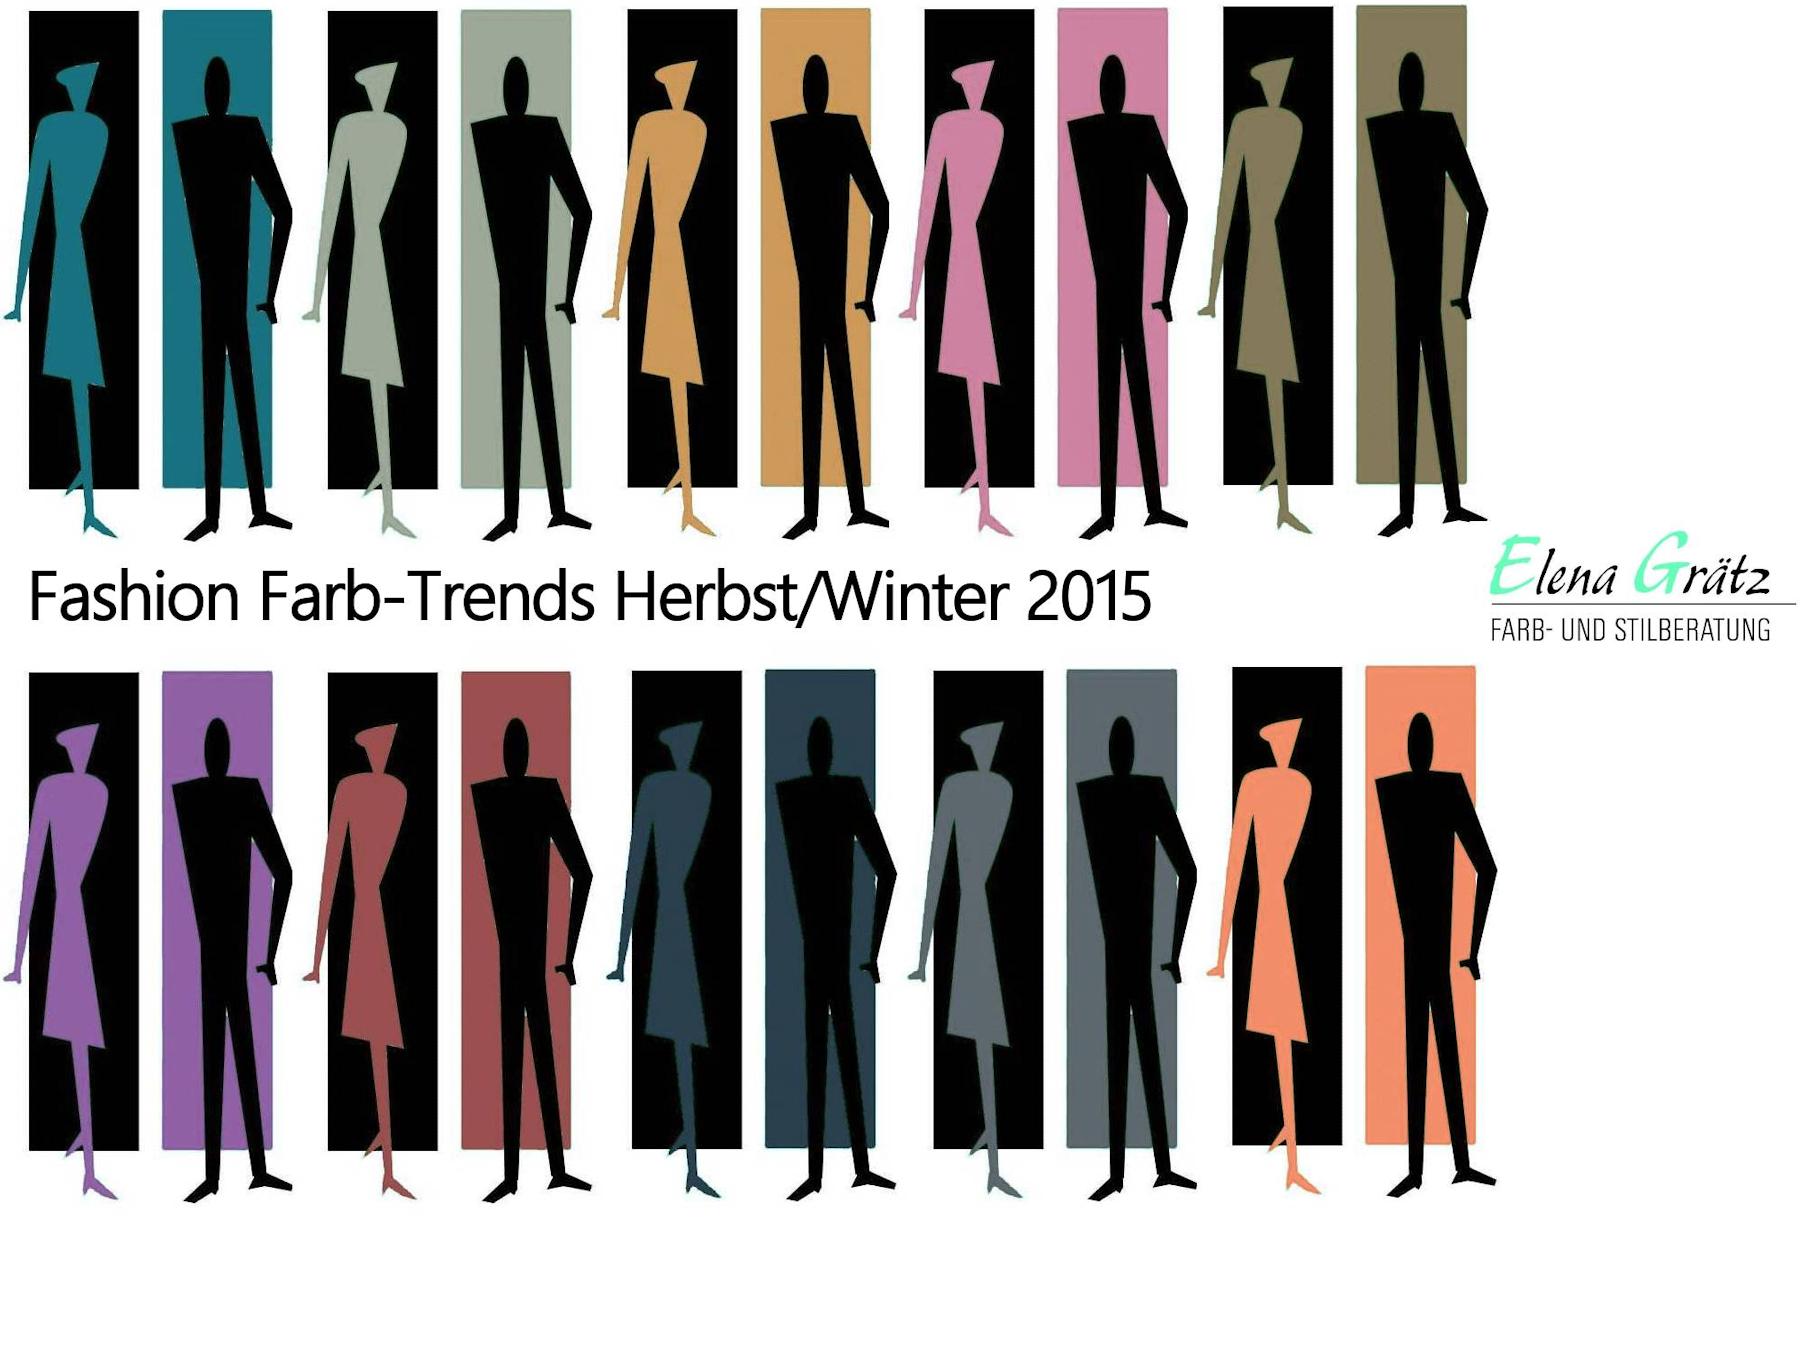 fashion farb palette f r herbst winter 2015 elena gr tz farb und stilberatung. Black Bedroom Furniture Sets. Home Design Ideas